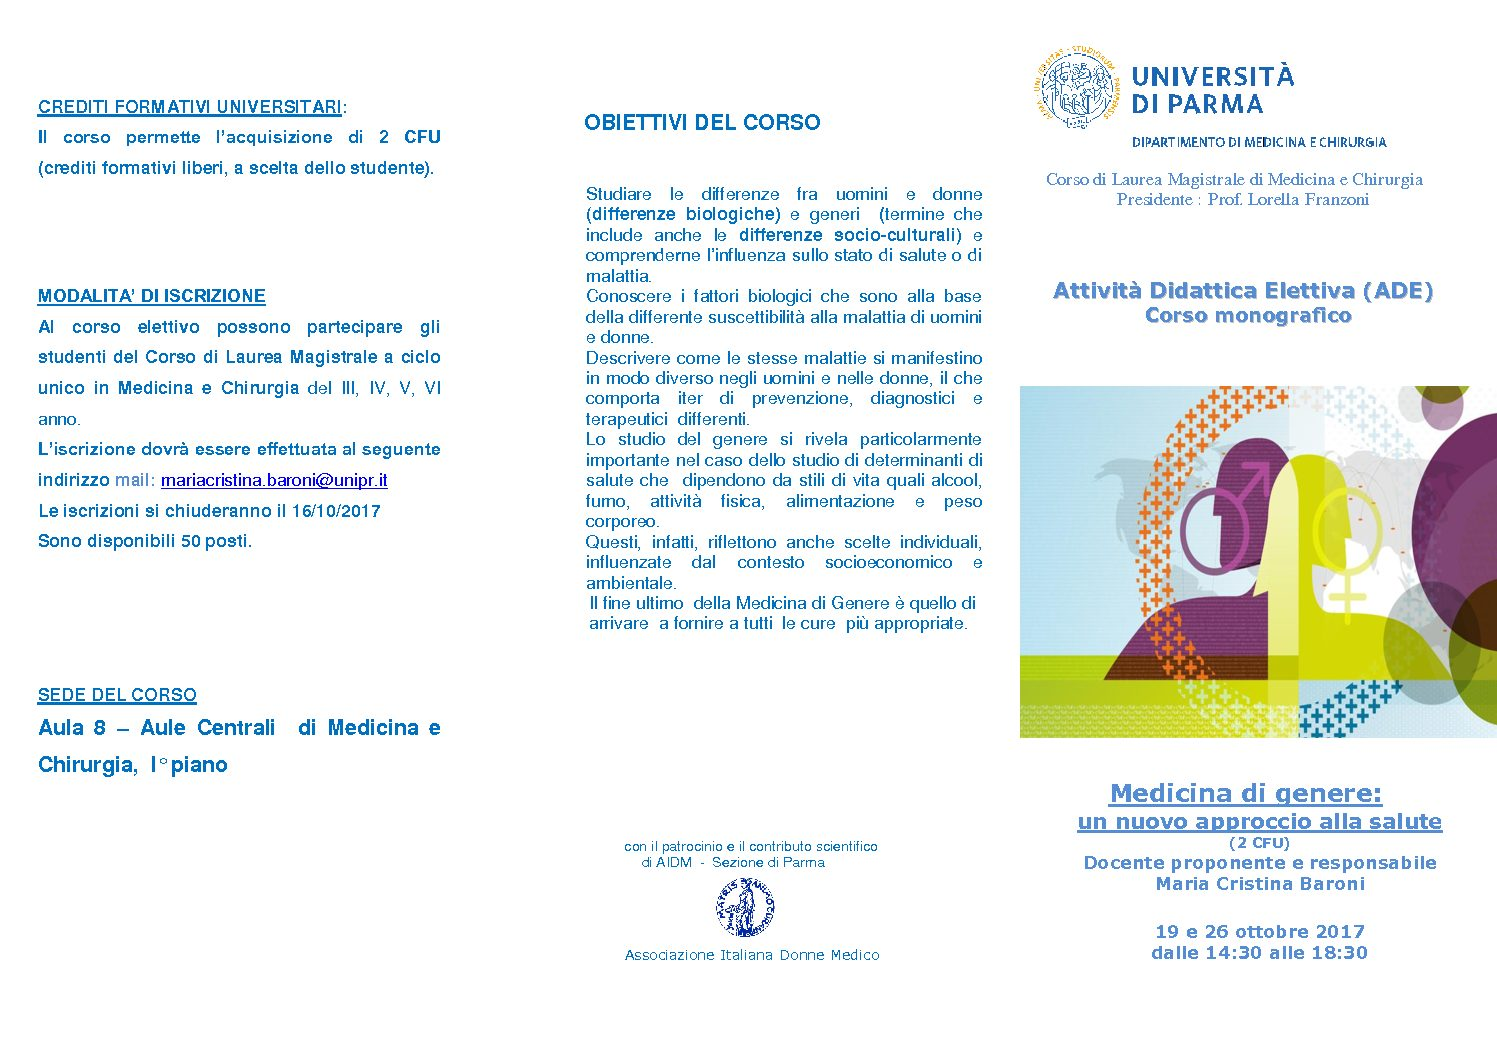 ADE MEDICINA DI GENERE 19 OTT pdf 2 pdf - ADE MEDICINA DI GENERE 19 OTT pdf 2